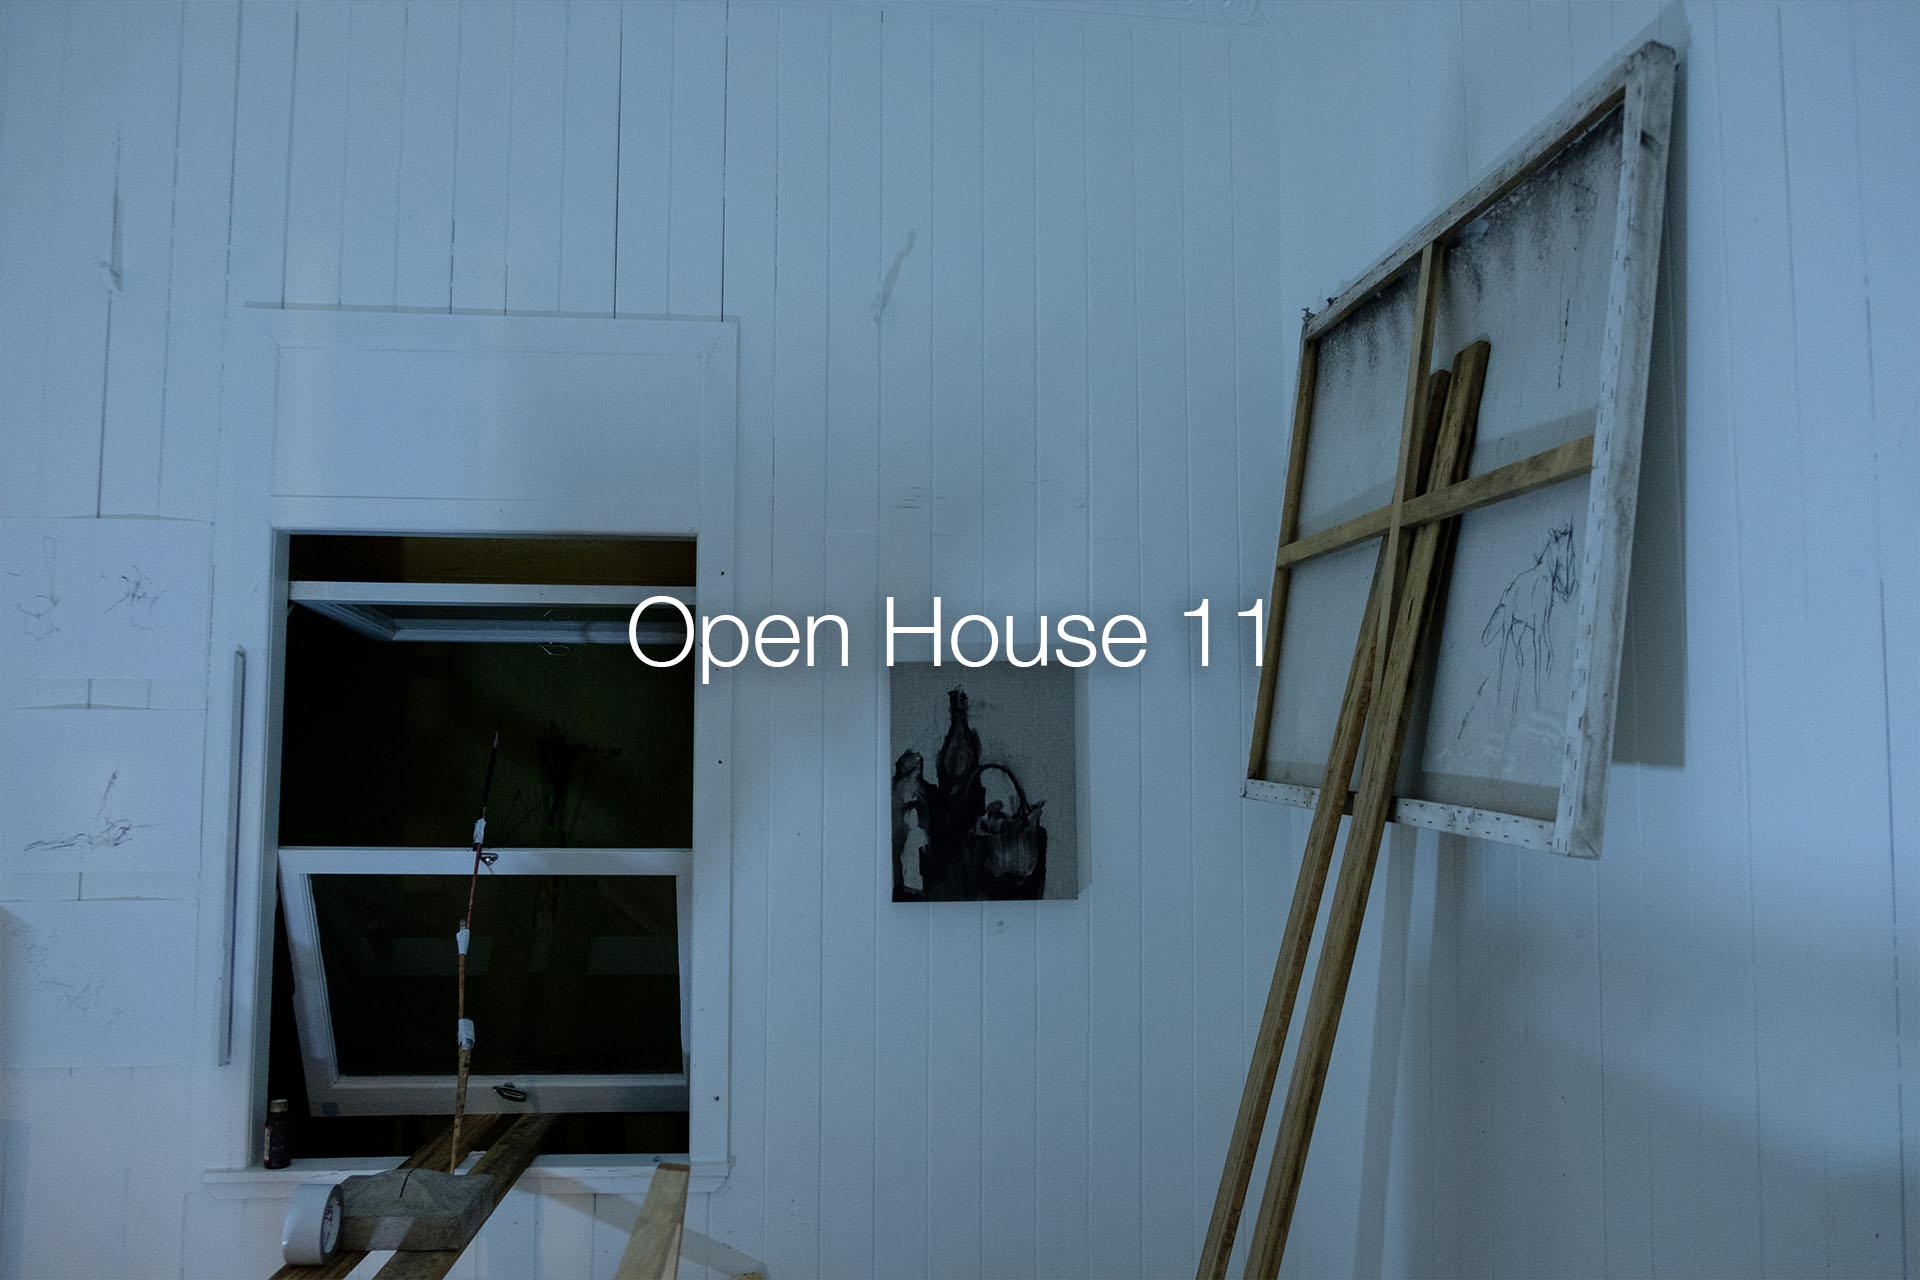 OpenHouse11.jpg